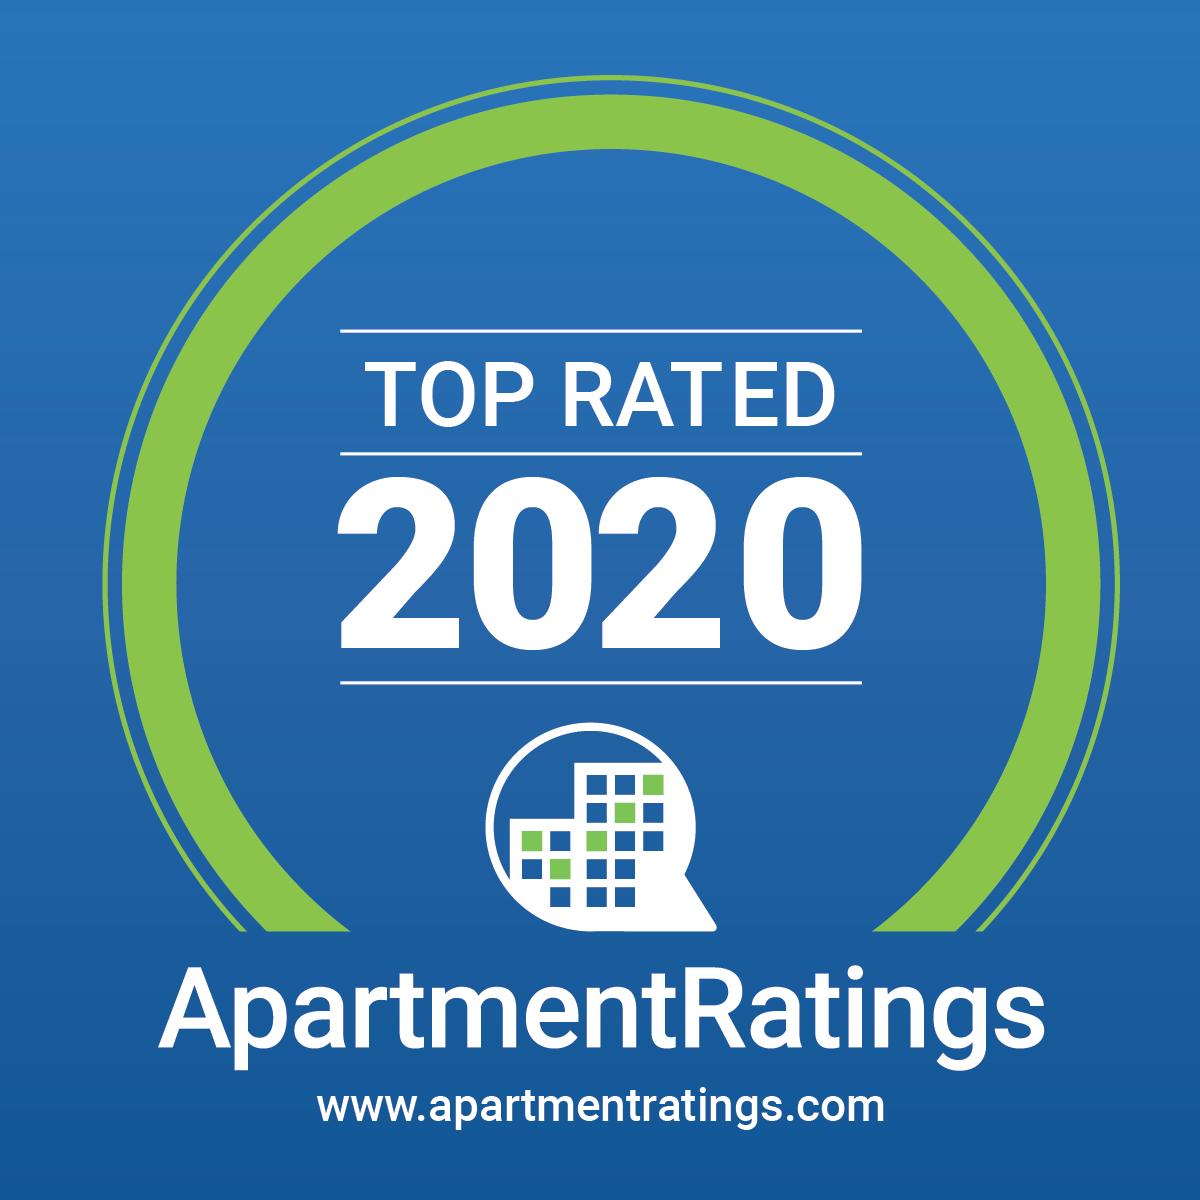 Apartment Ratings 2020 Award